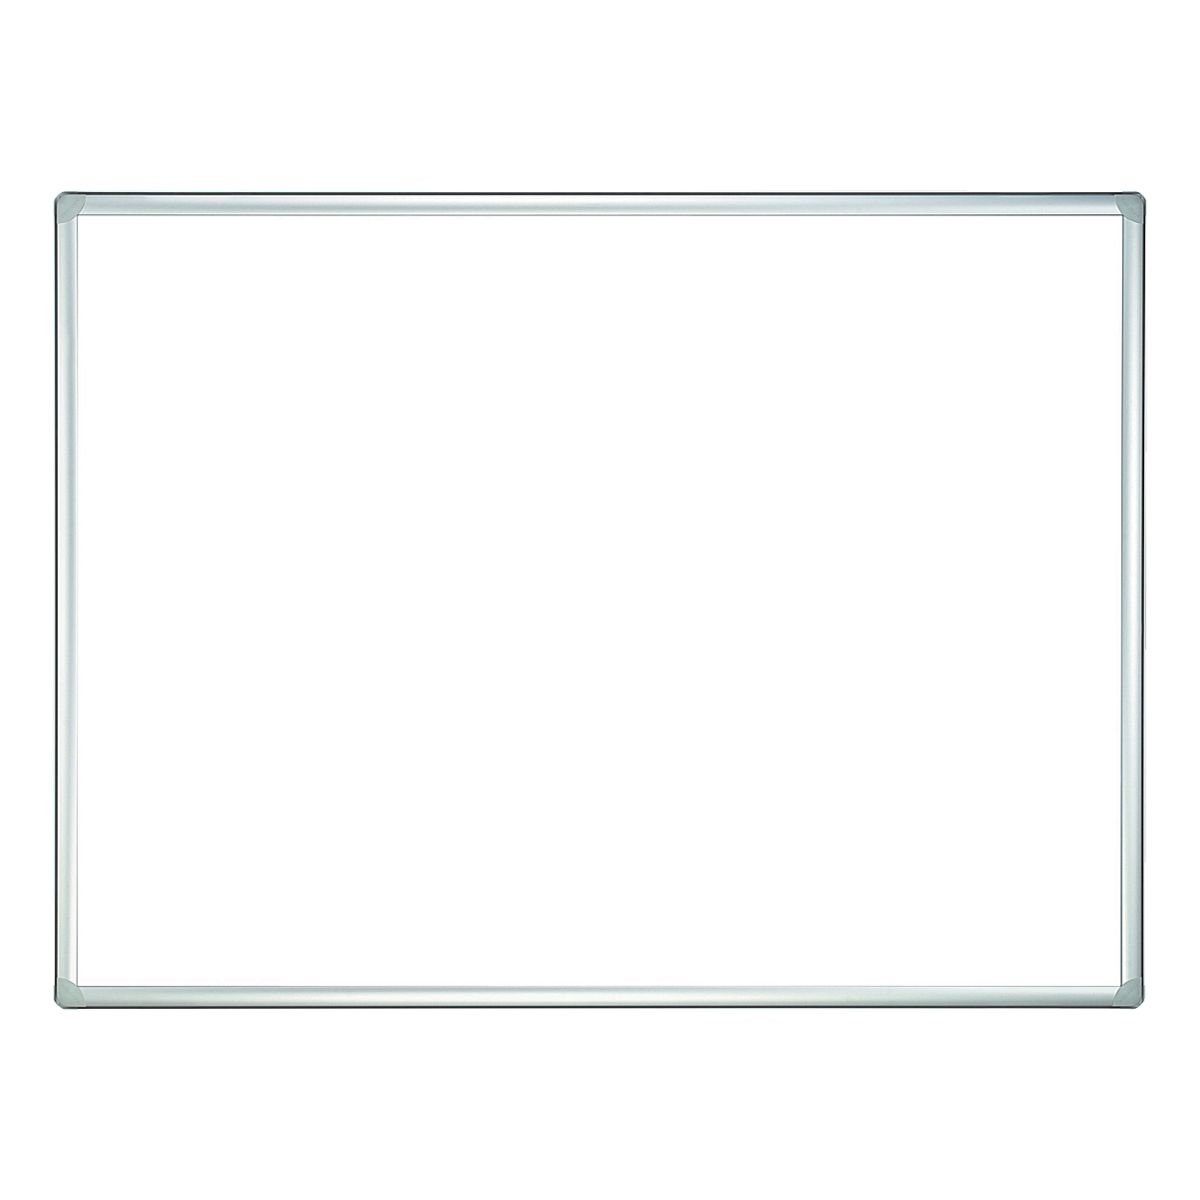 FRANKEN Whiteboard emailliert, projektionsfähig, 150 x 100 cm »PRO SC8809«